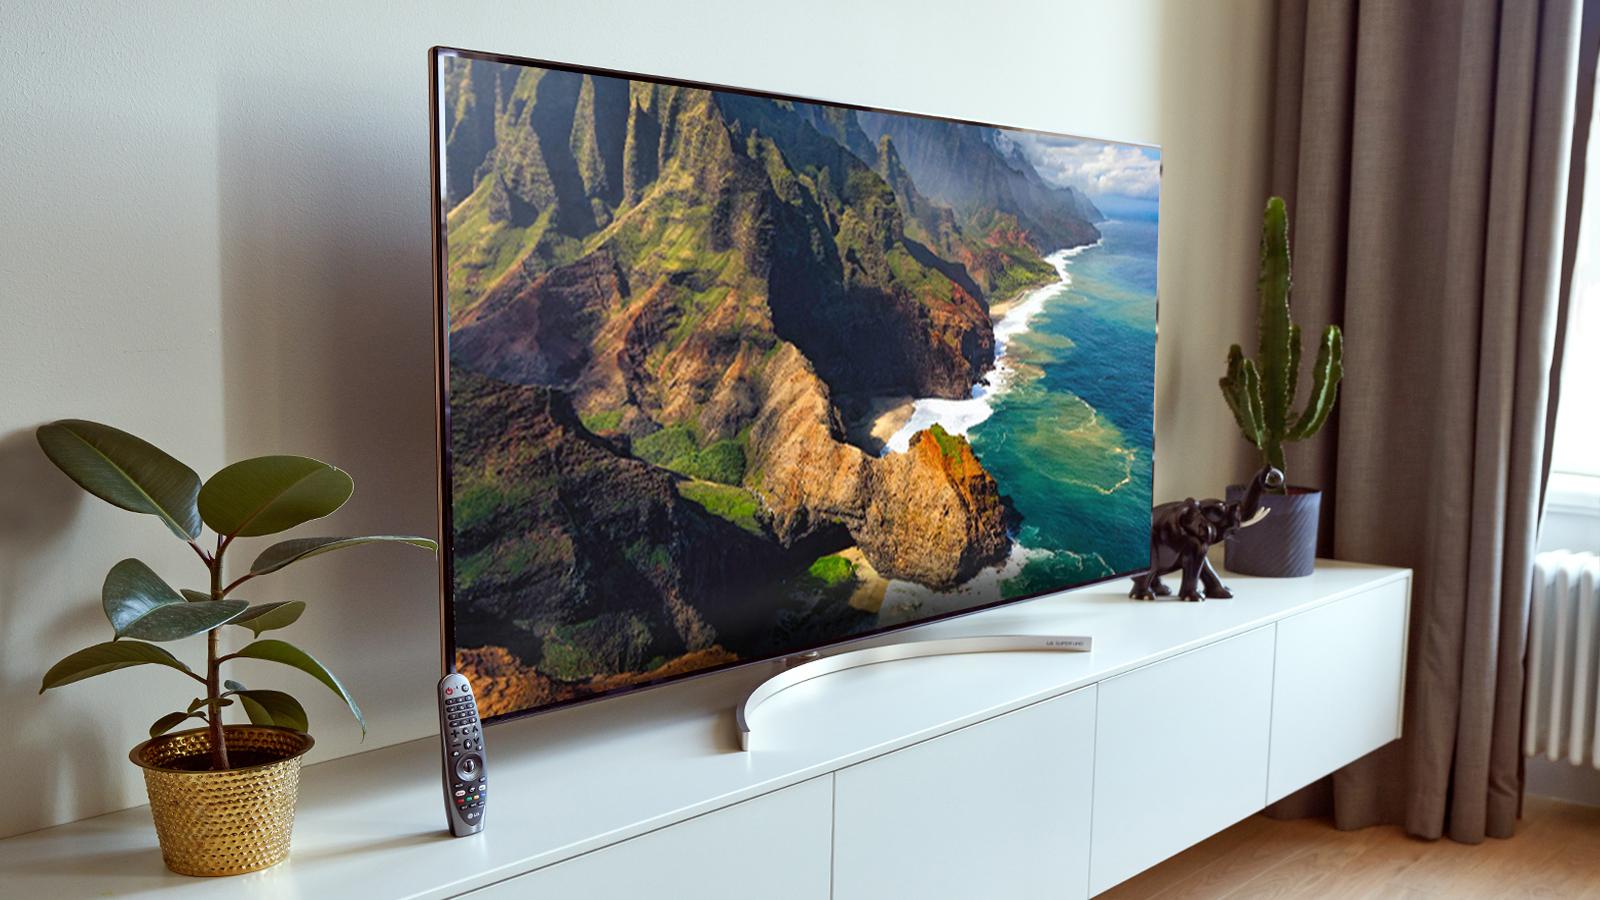 LG SUPER UHD TV - Power fi